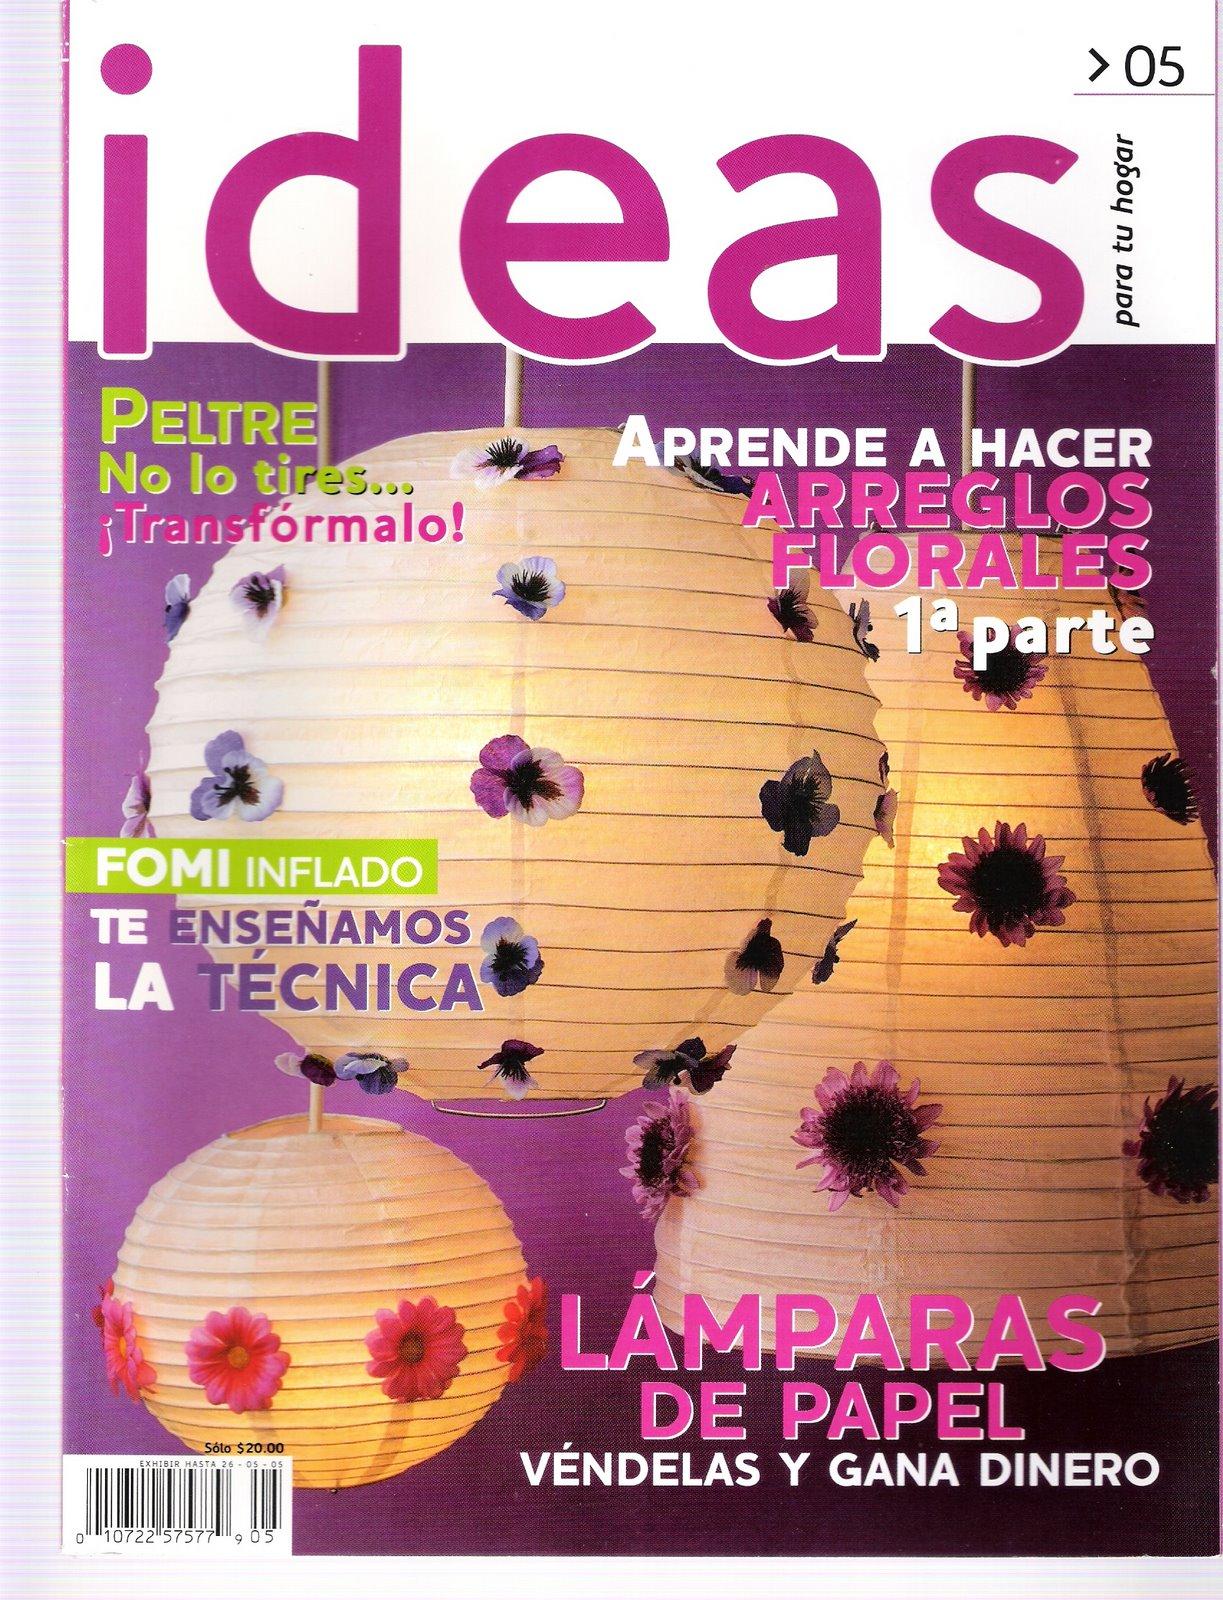 TODAS LAS REVISTAS DE MANUALIDADES GRATIS: Ideas nº 05 - revista ...